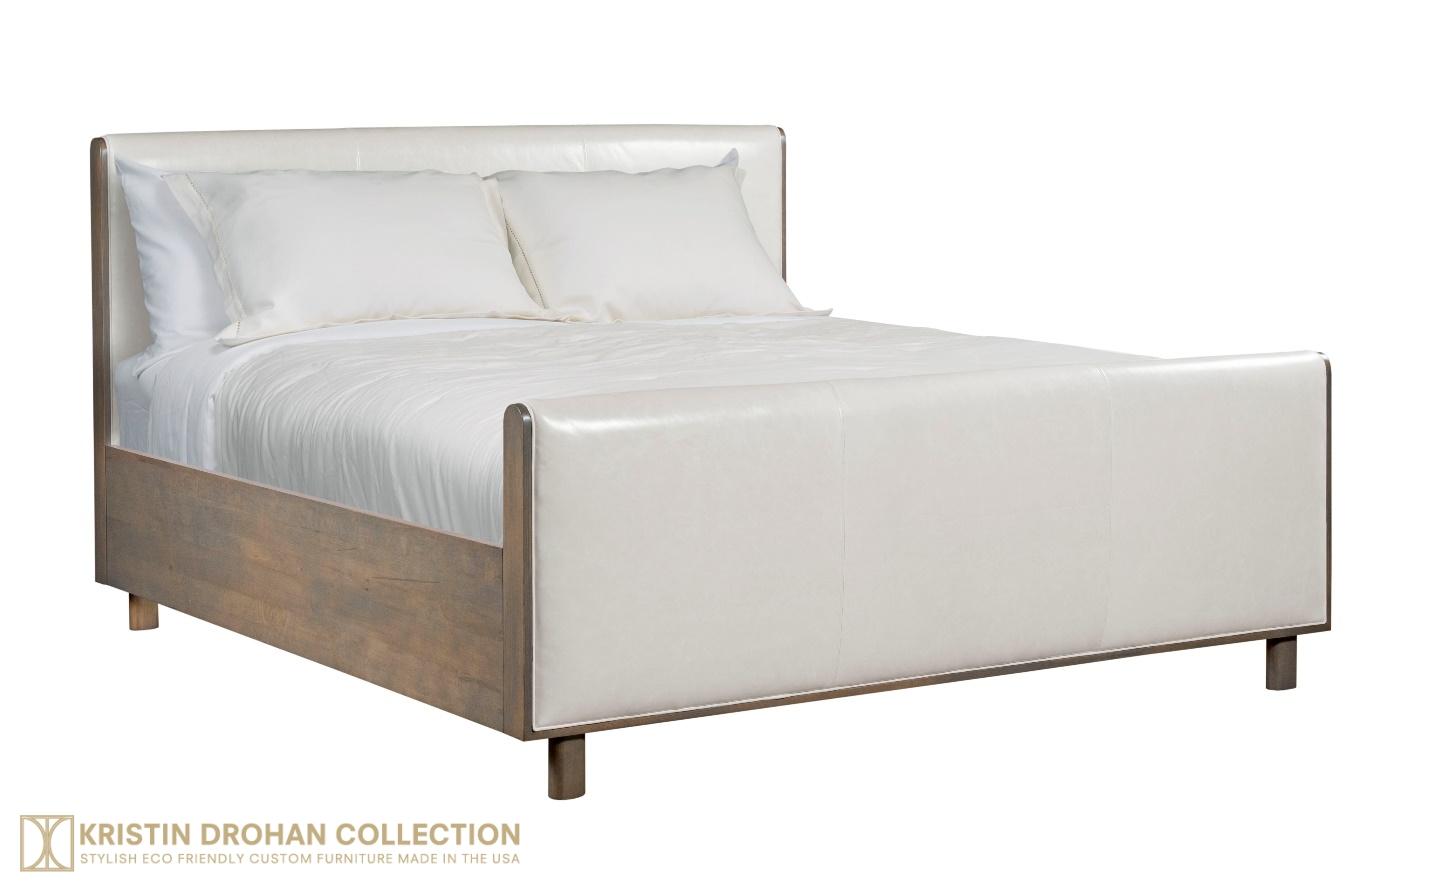 Tribeca Bed, luxury panel bed